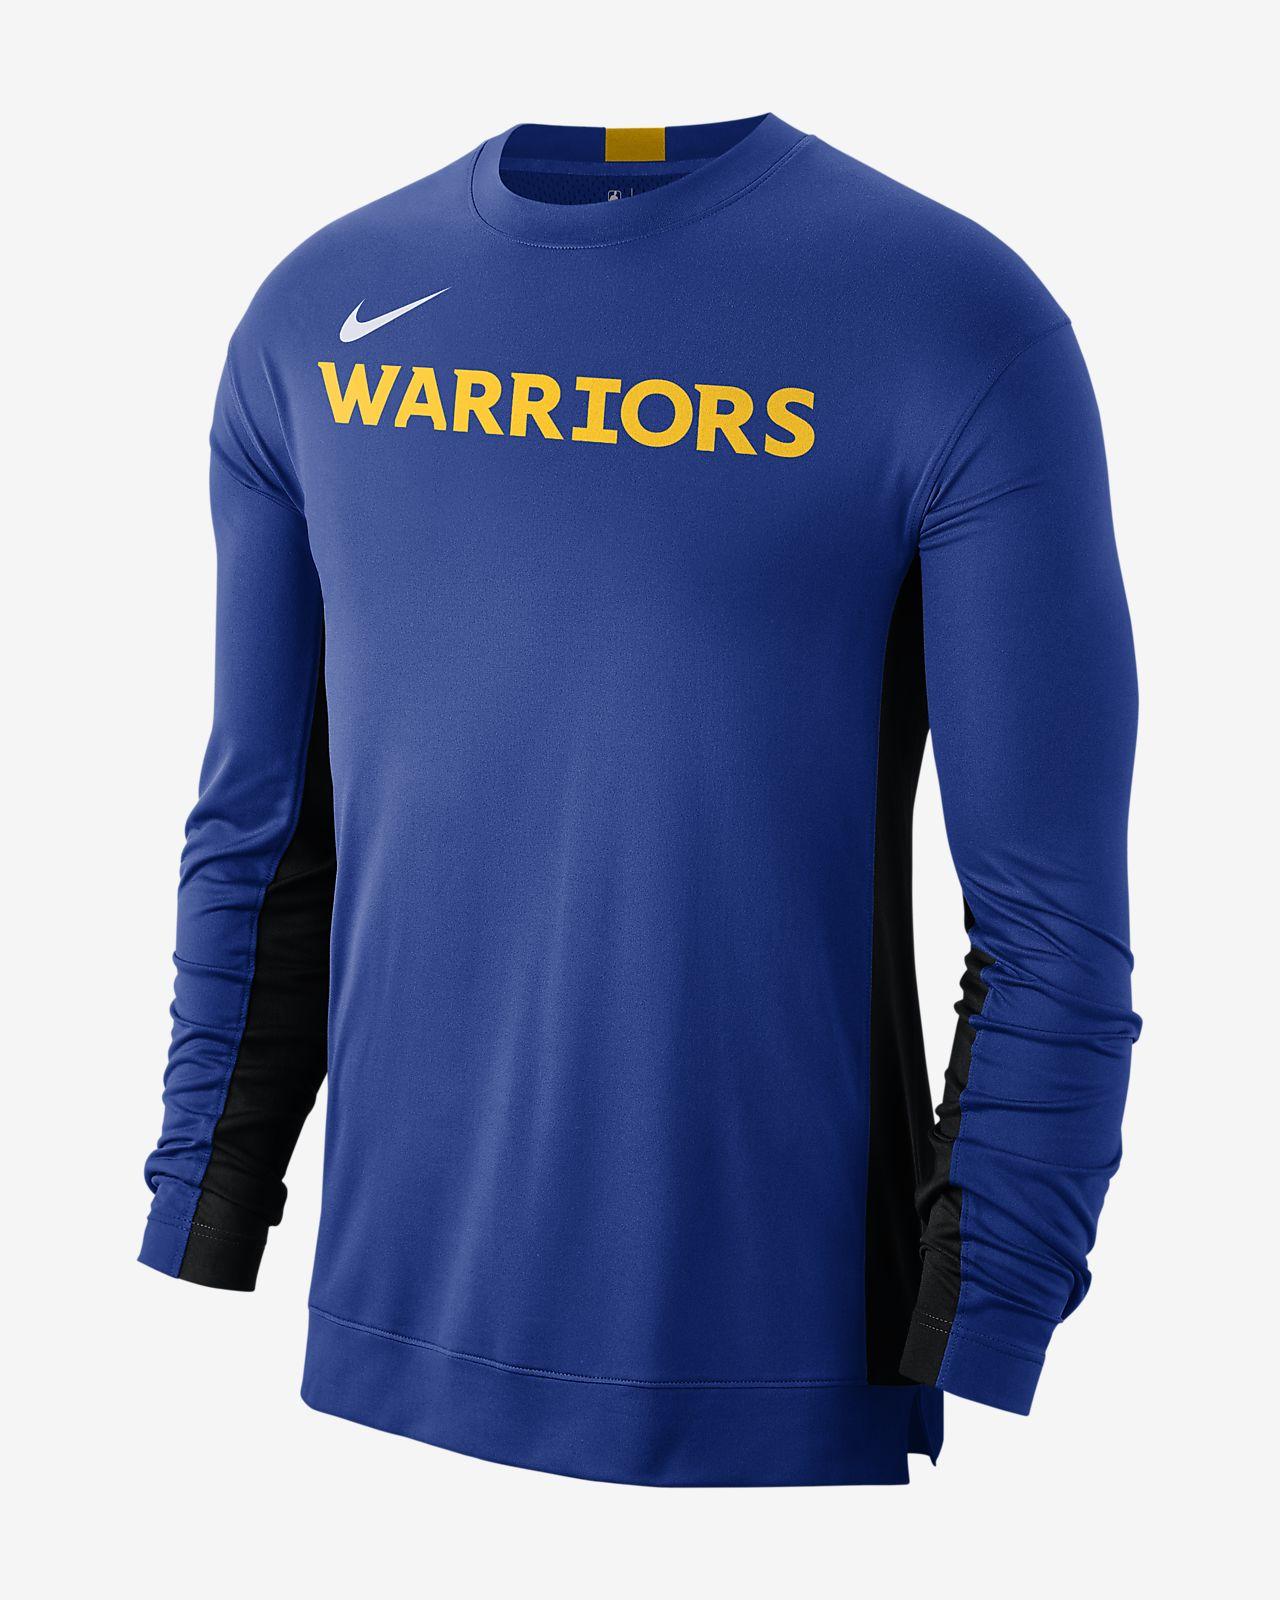 Playera de entrenamiento de la NBA para hombre Golden State Warriors Nike Dri-FIT